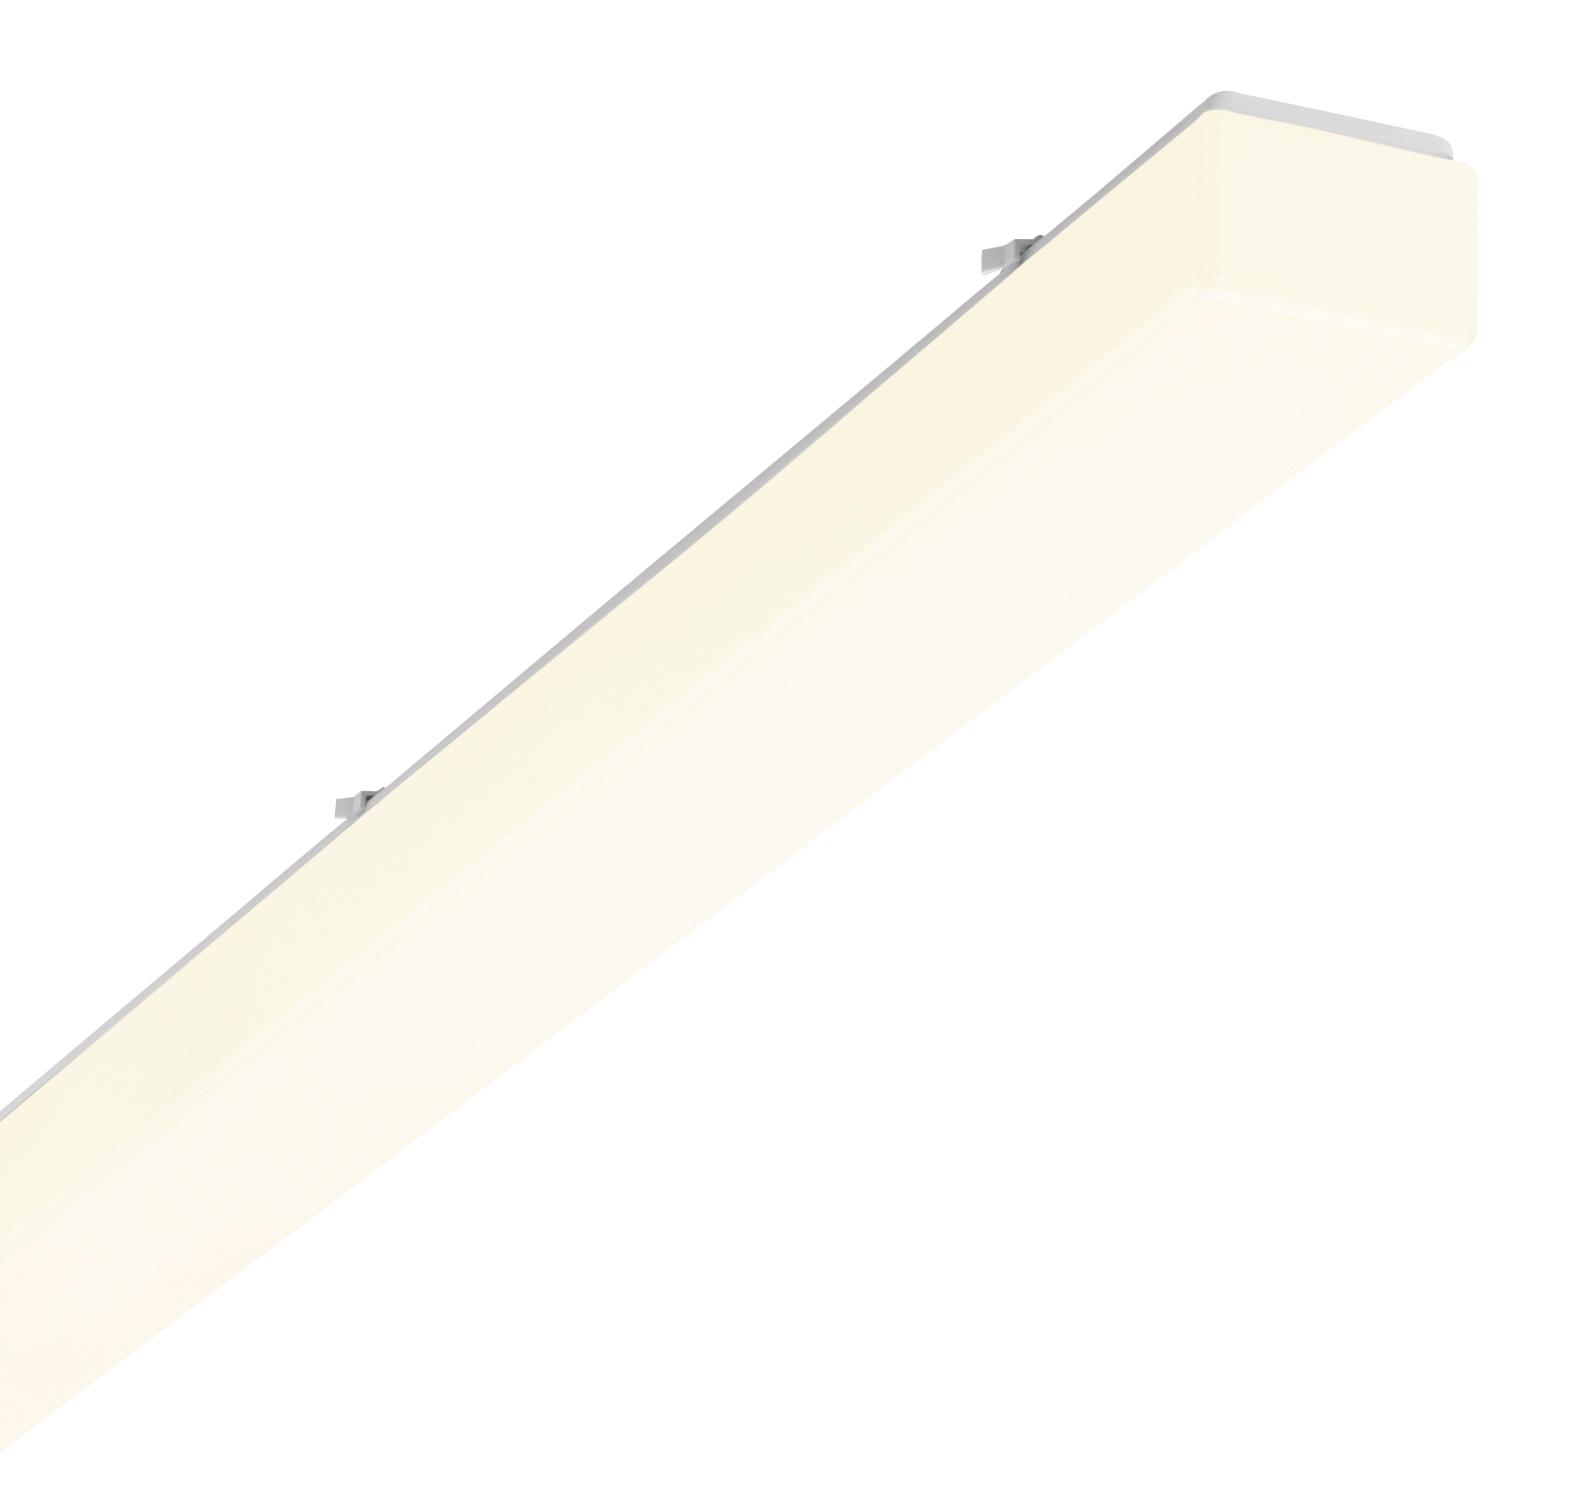 1 Stk AOT-O LED Wannenleuchte, 62W, 4000K, IP50, acryl, opal, Weiß LI70122062